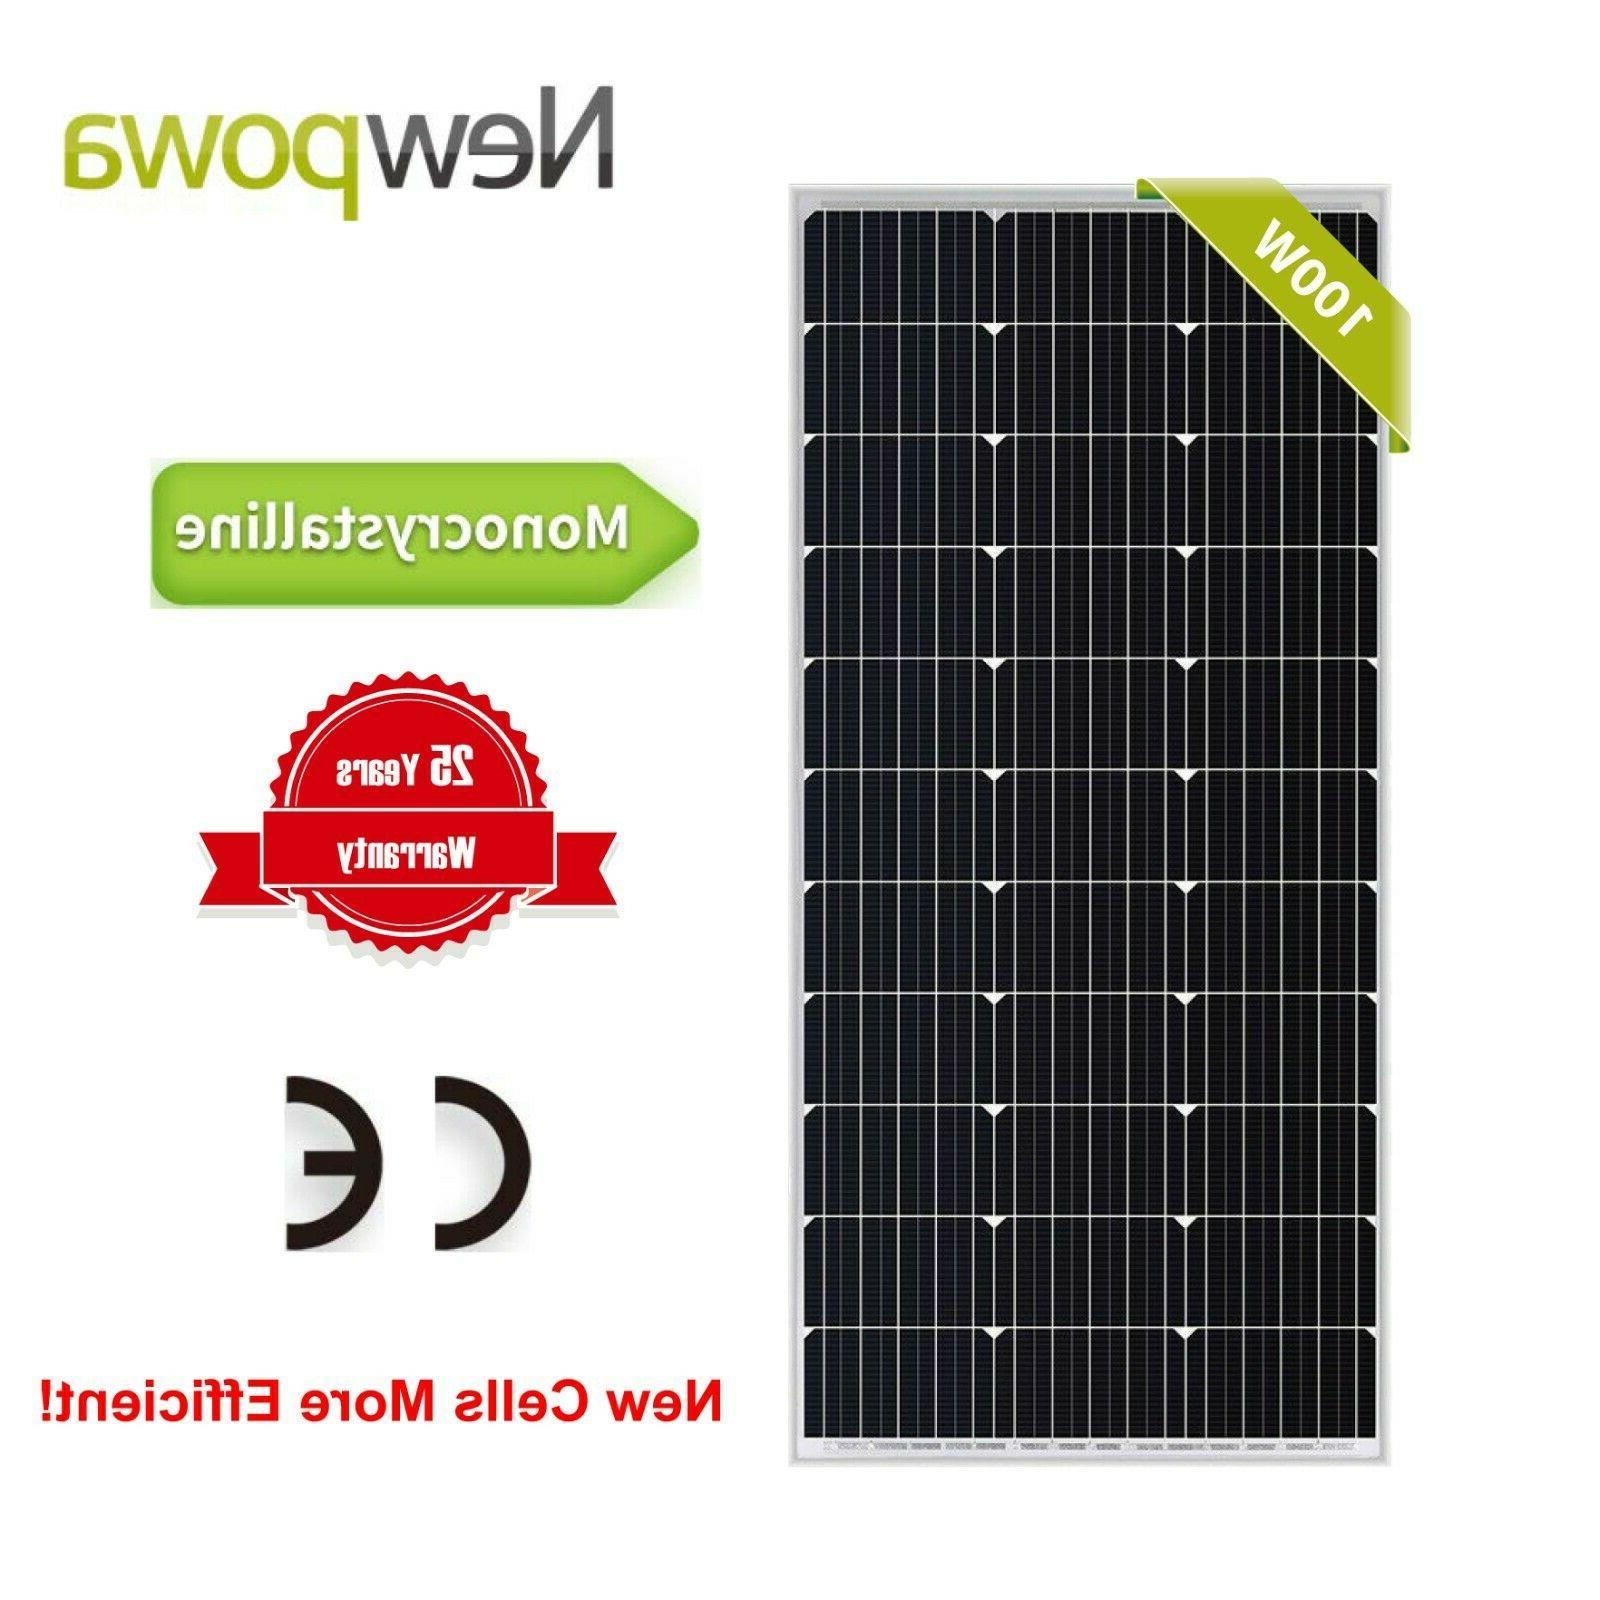 100w watts 12v monocrystalline solar panel off